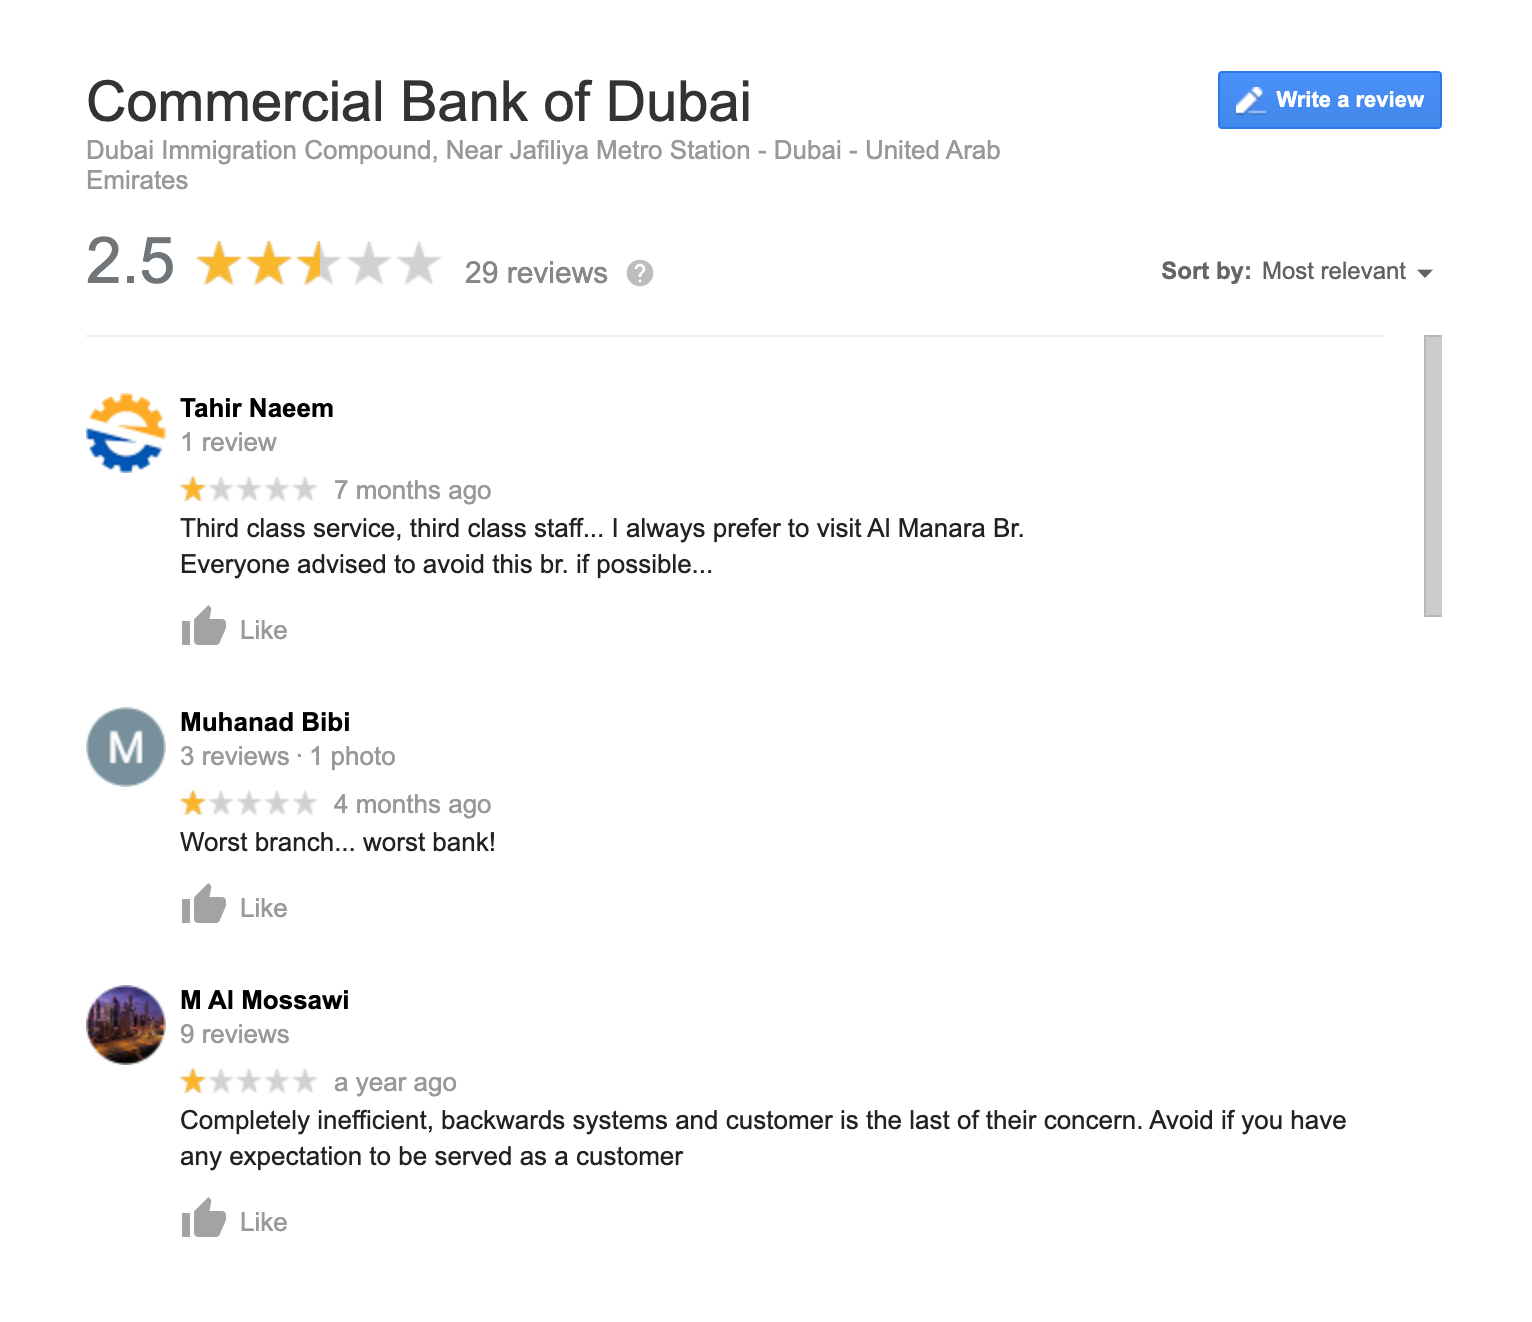 Unanswered reviews of bank in Dubai